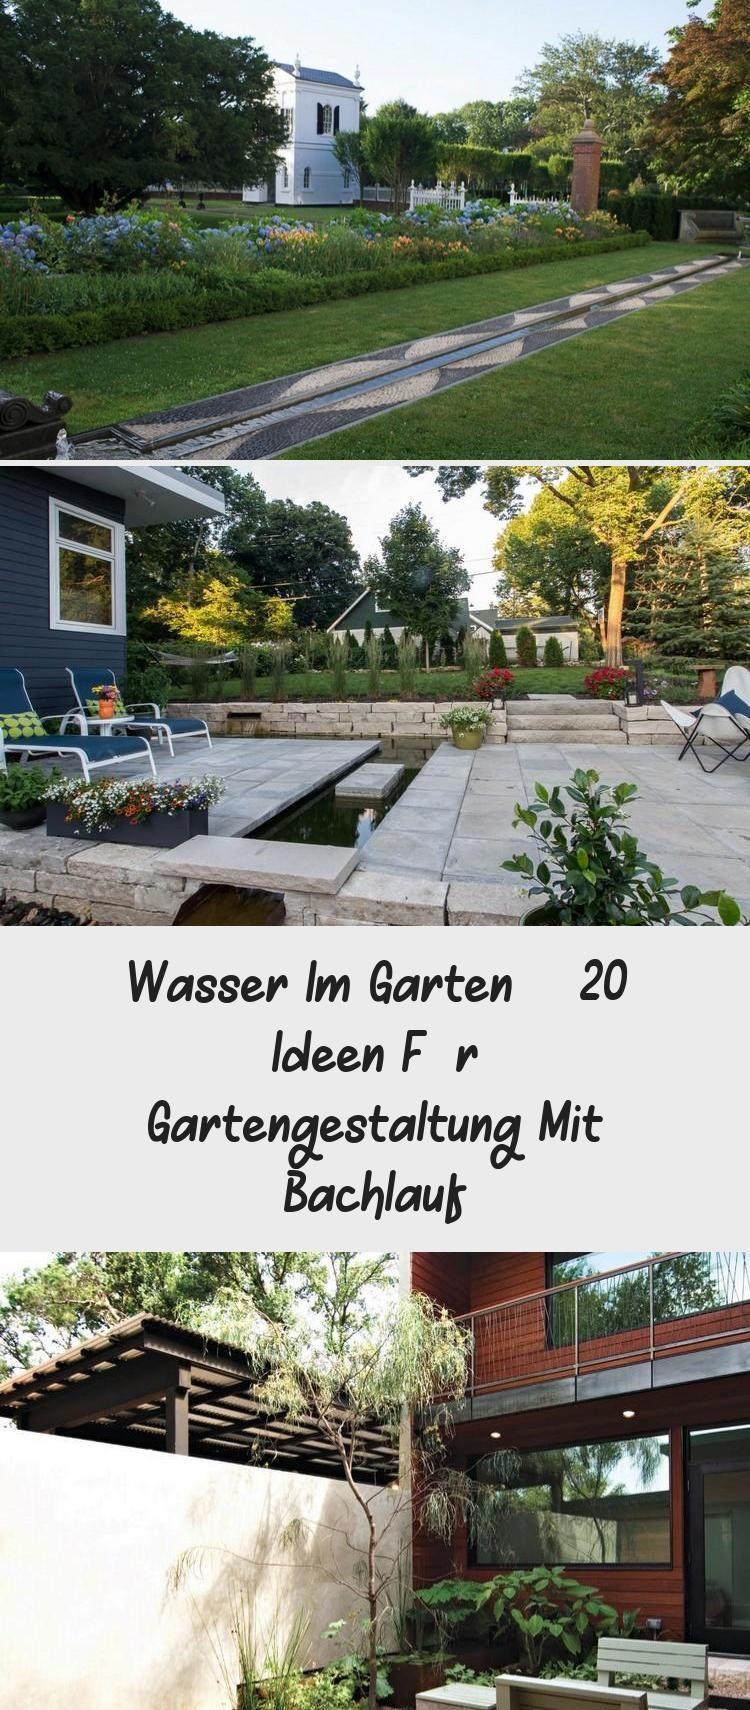 Wasser Im Garten 20 Ideen Fur Gartengestaltung Mit Bachlauf Wasser Im Garten 20 Ideen Fur Gartengestaltung Mit Bachlauf Garte In 2020 Sidewalk Structures